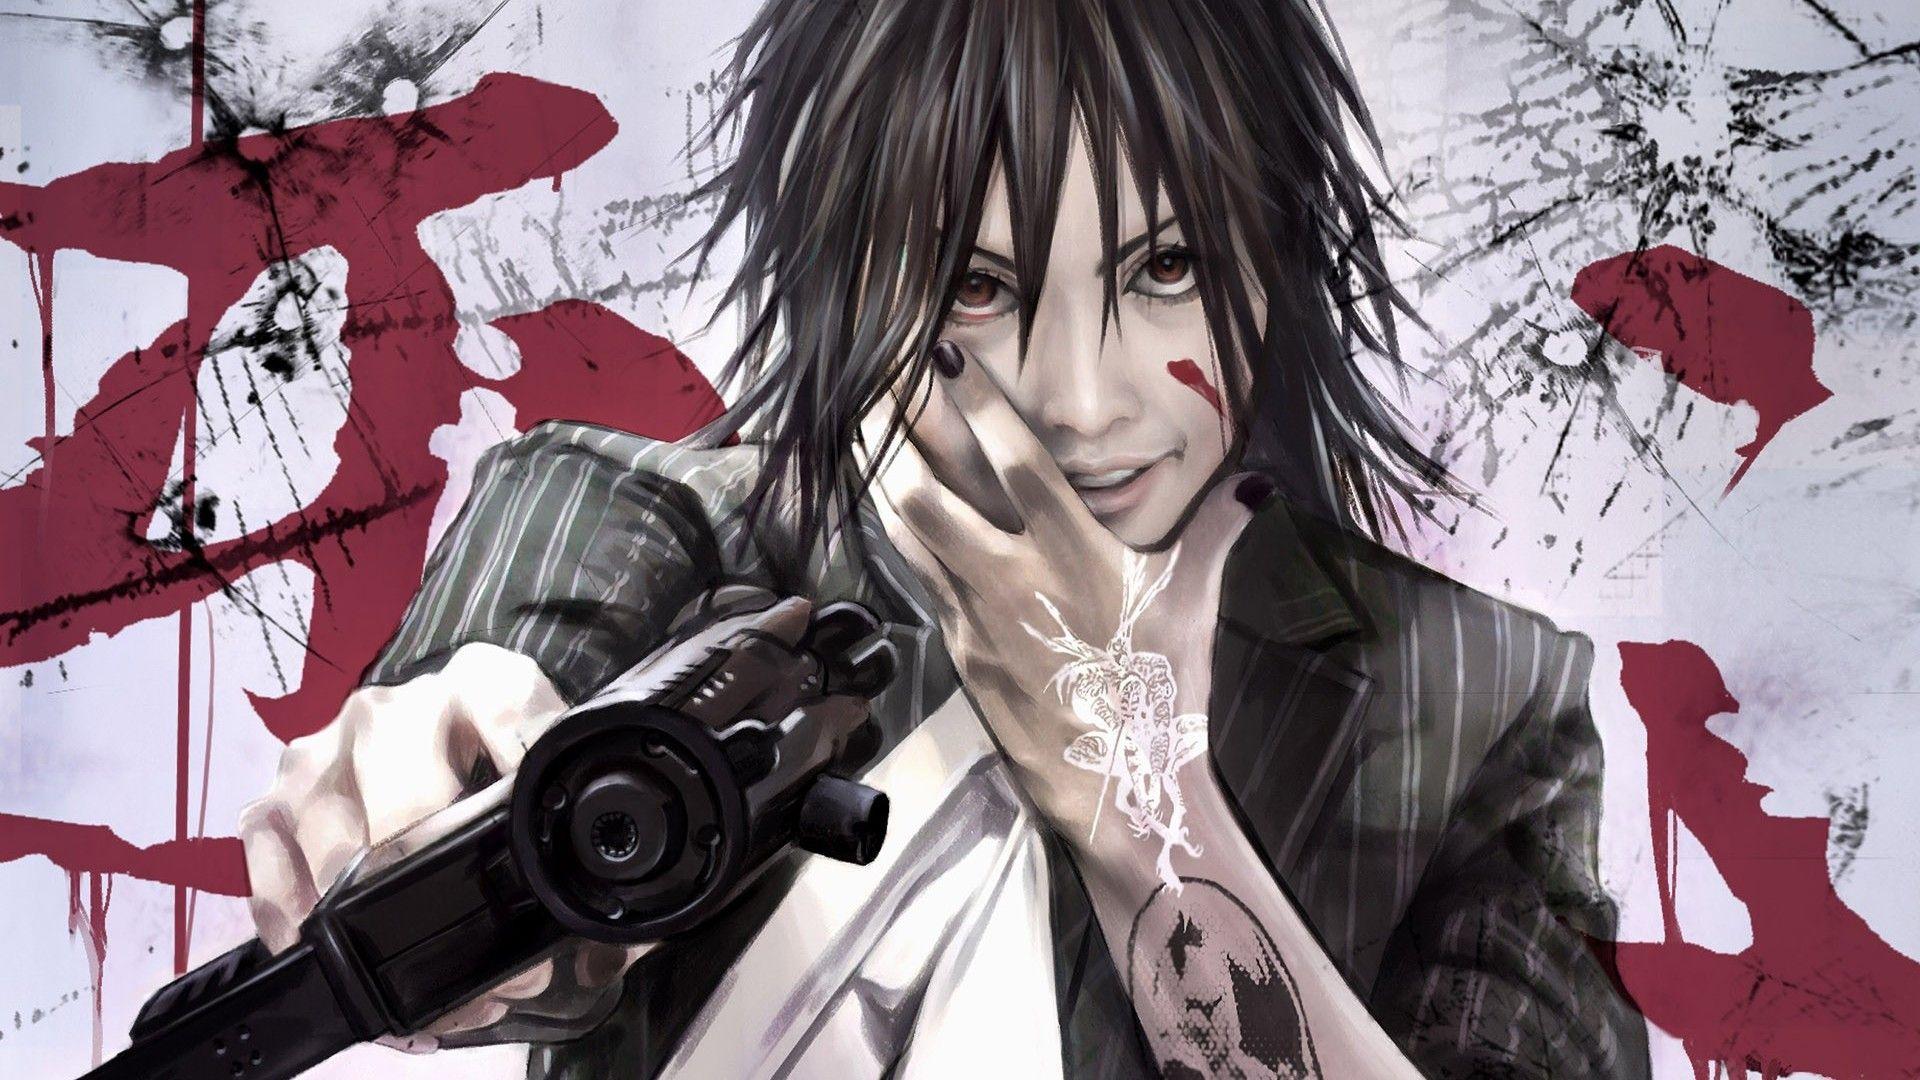 Pin By Skylaa On Anime Anime Characters Wallpaper Anime Background Anime Wallpaper Anime boys with guns wallpaper